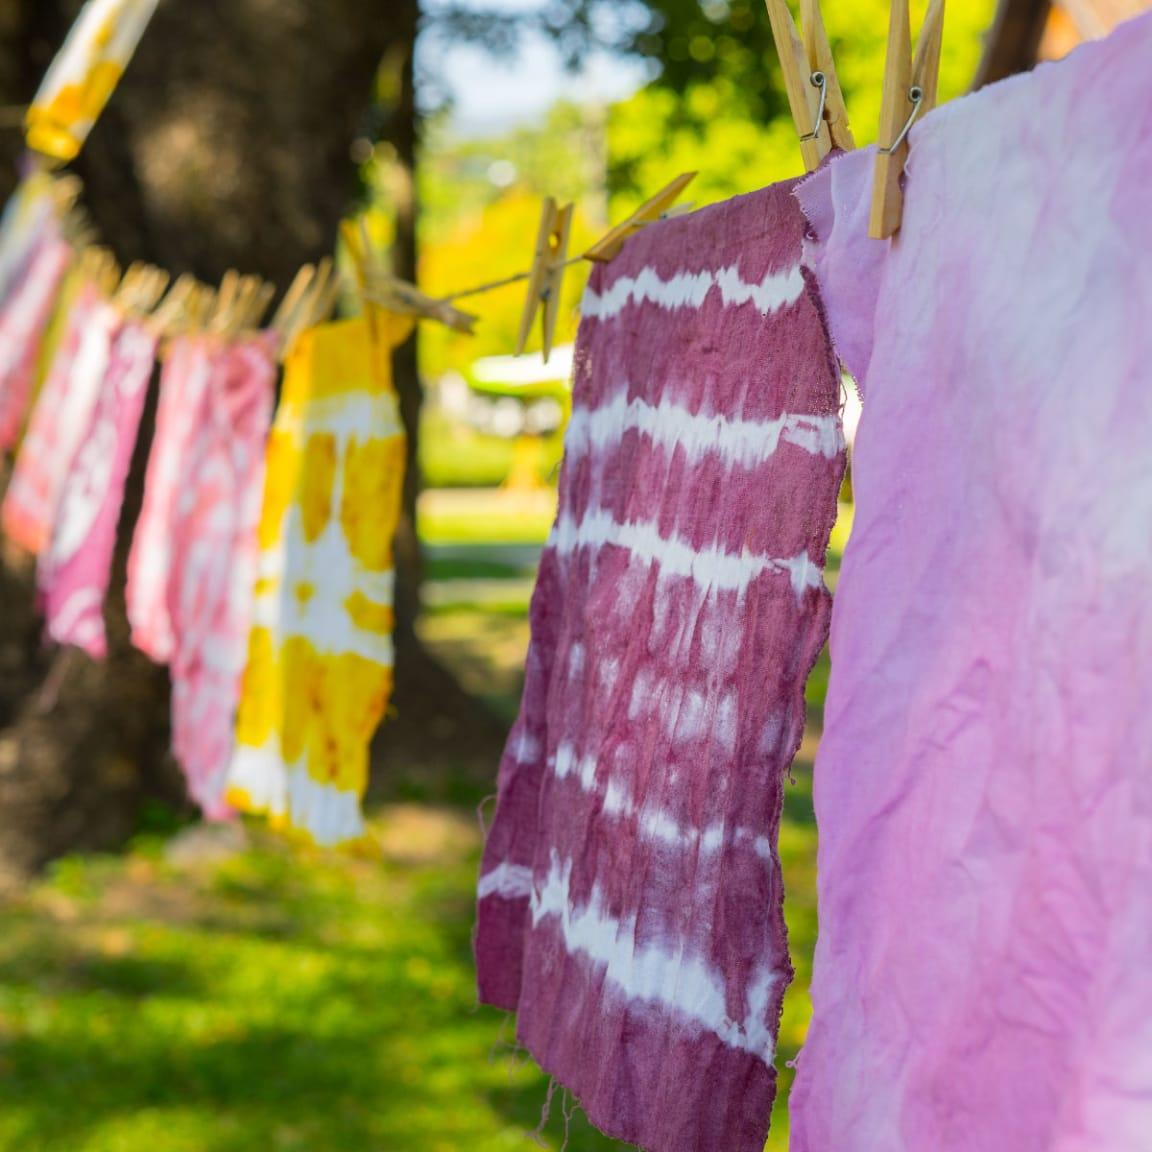 DIY Series: Tie-dye dreams